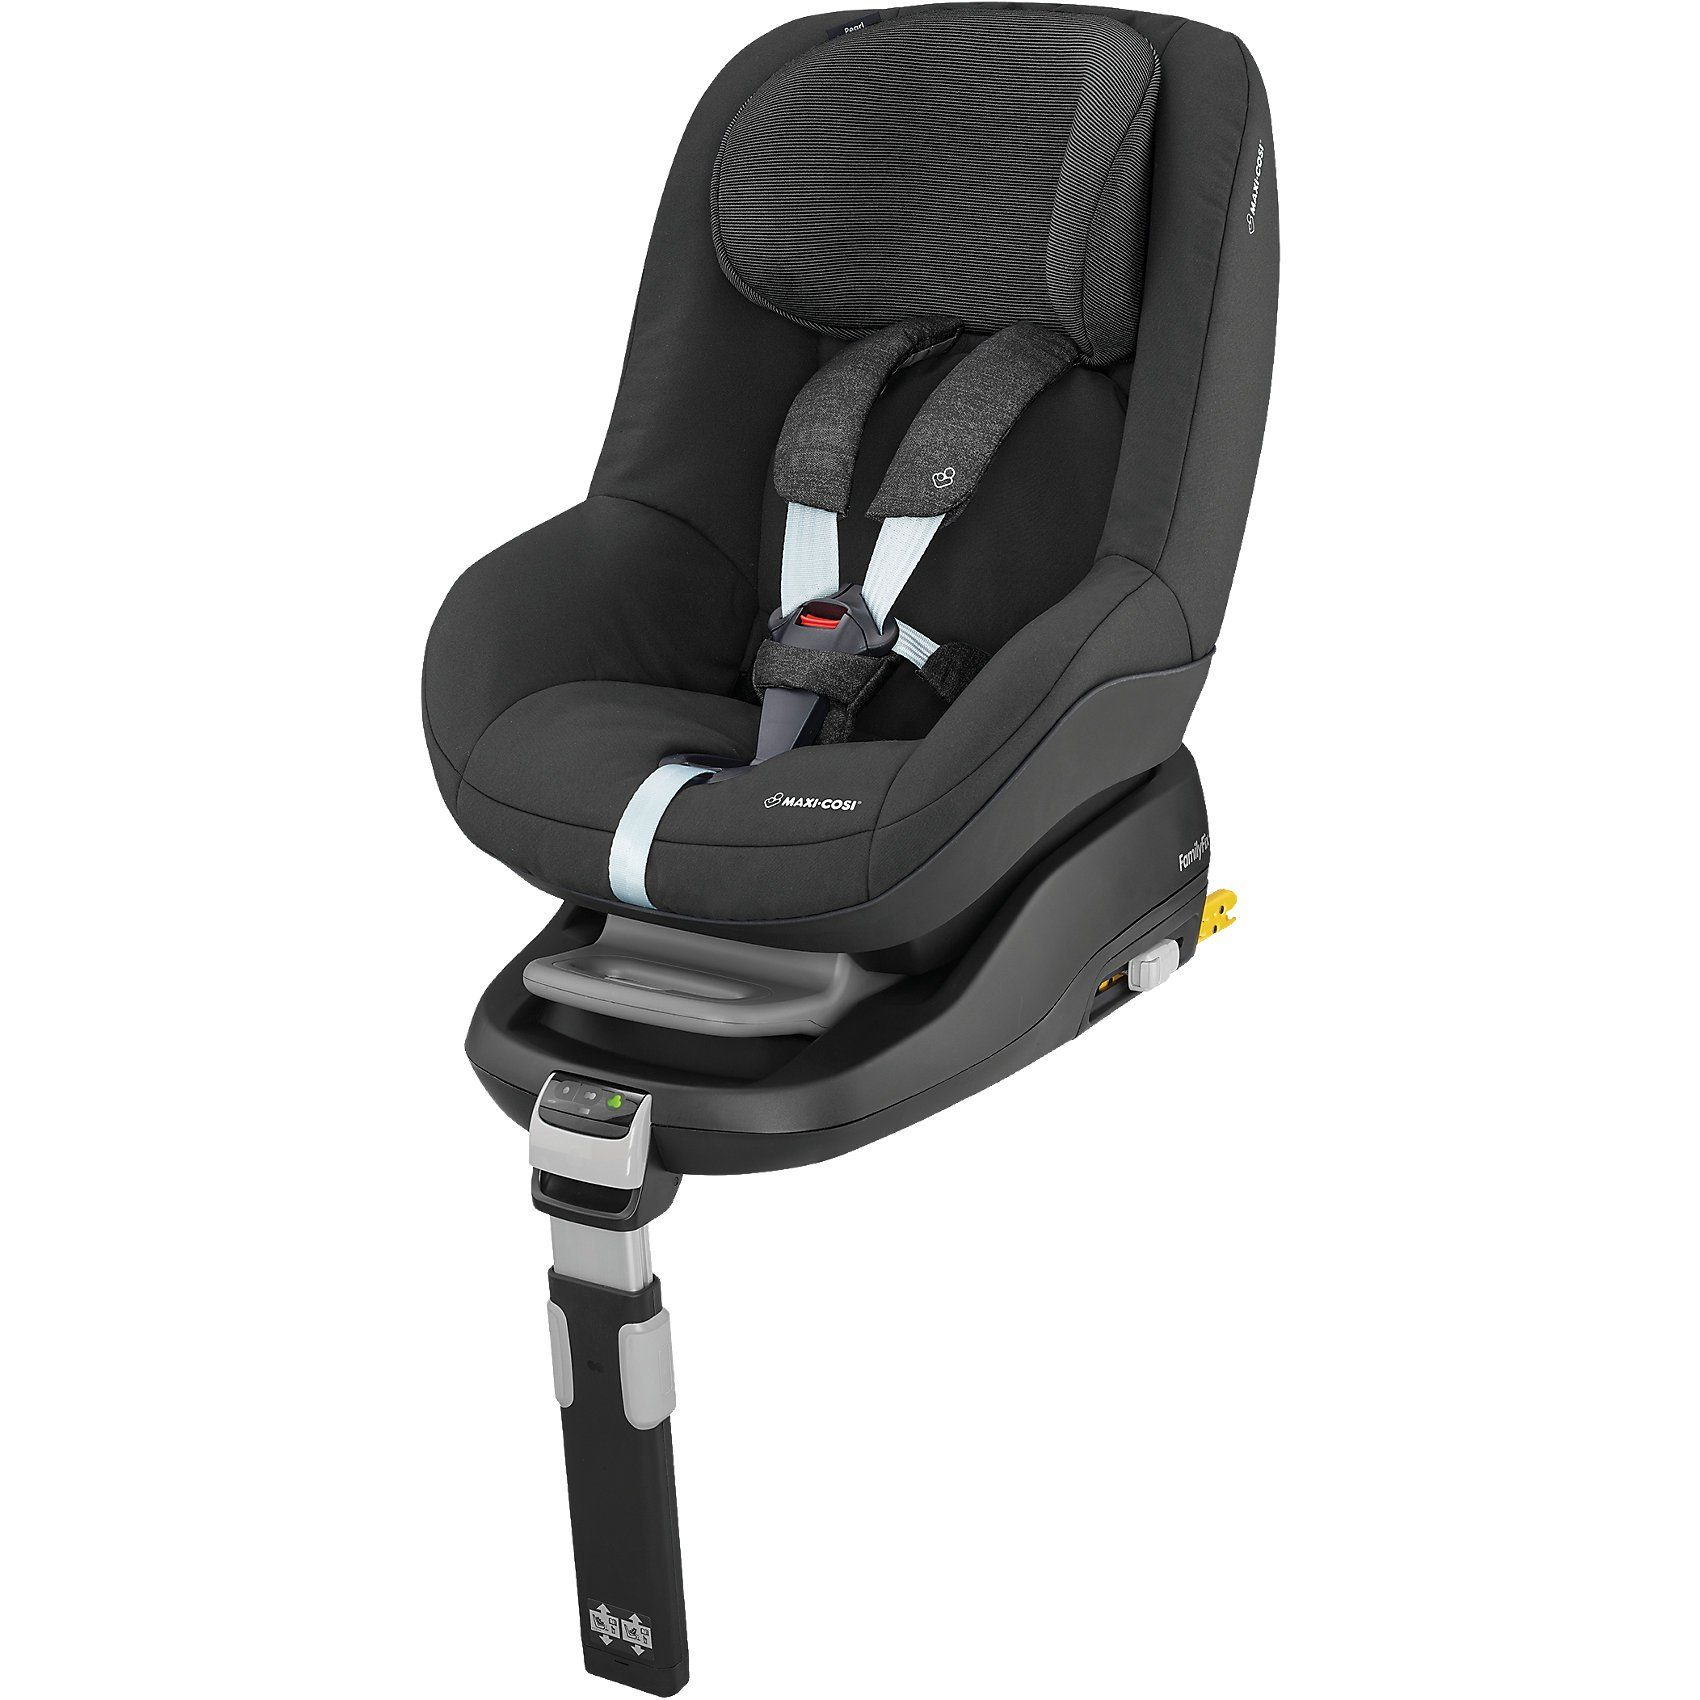 Maxi-Cosi Auto-Kindersitz Pearl, Nomad Black, 2018